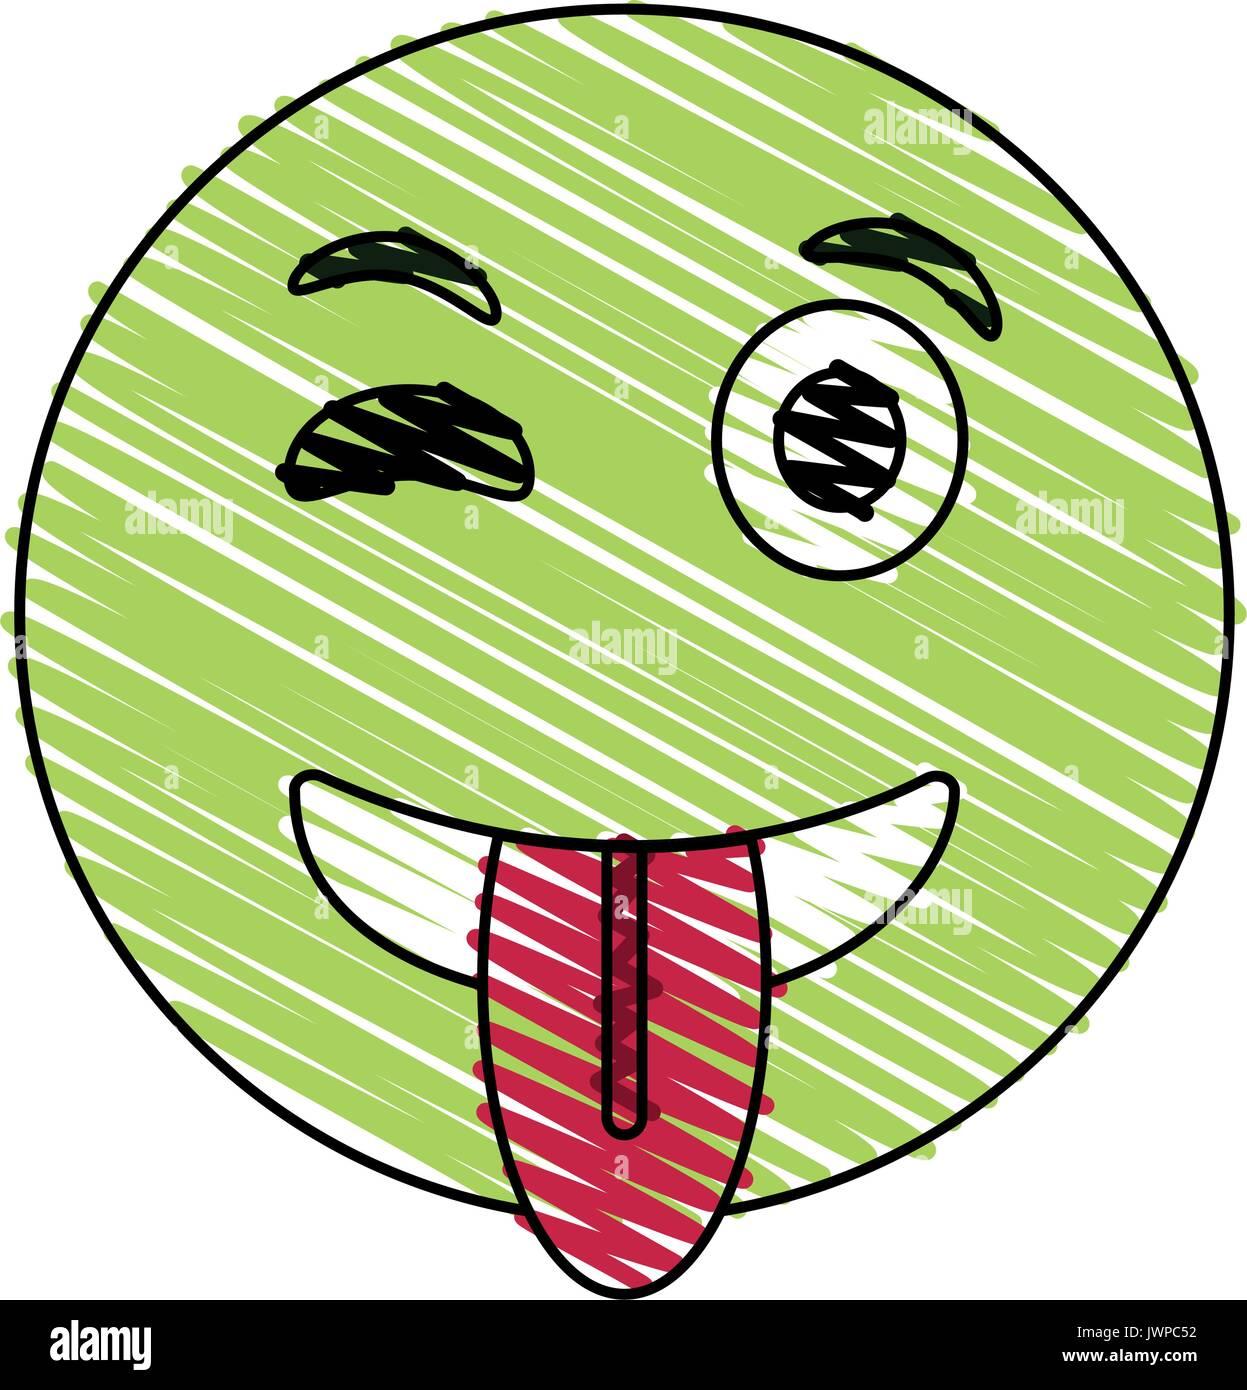 wink smile tongue out emoji icon image  - Stock Image